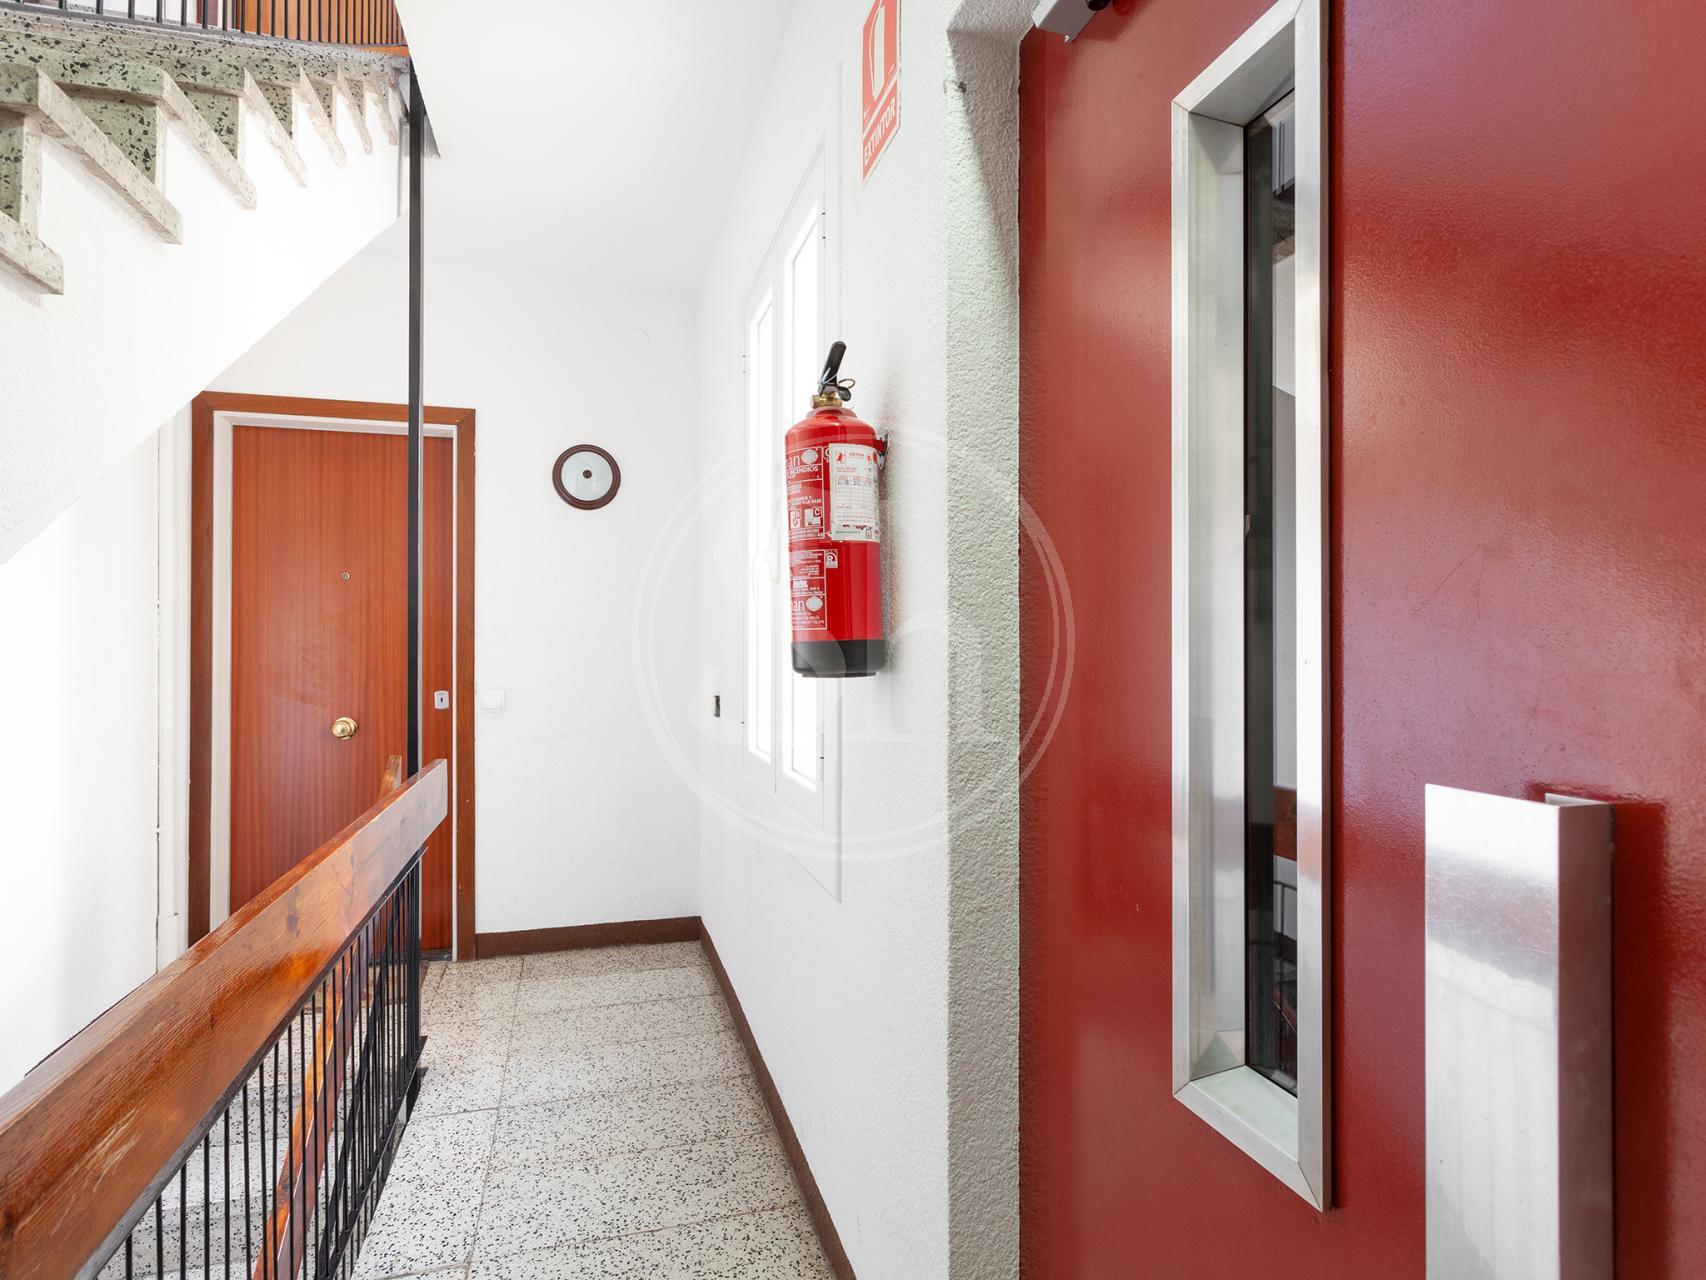 Acogedor piso tur stico en hospitalet de llobregat shbarcelona - Piso turistico barcelona ...